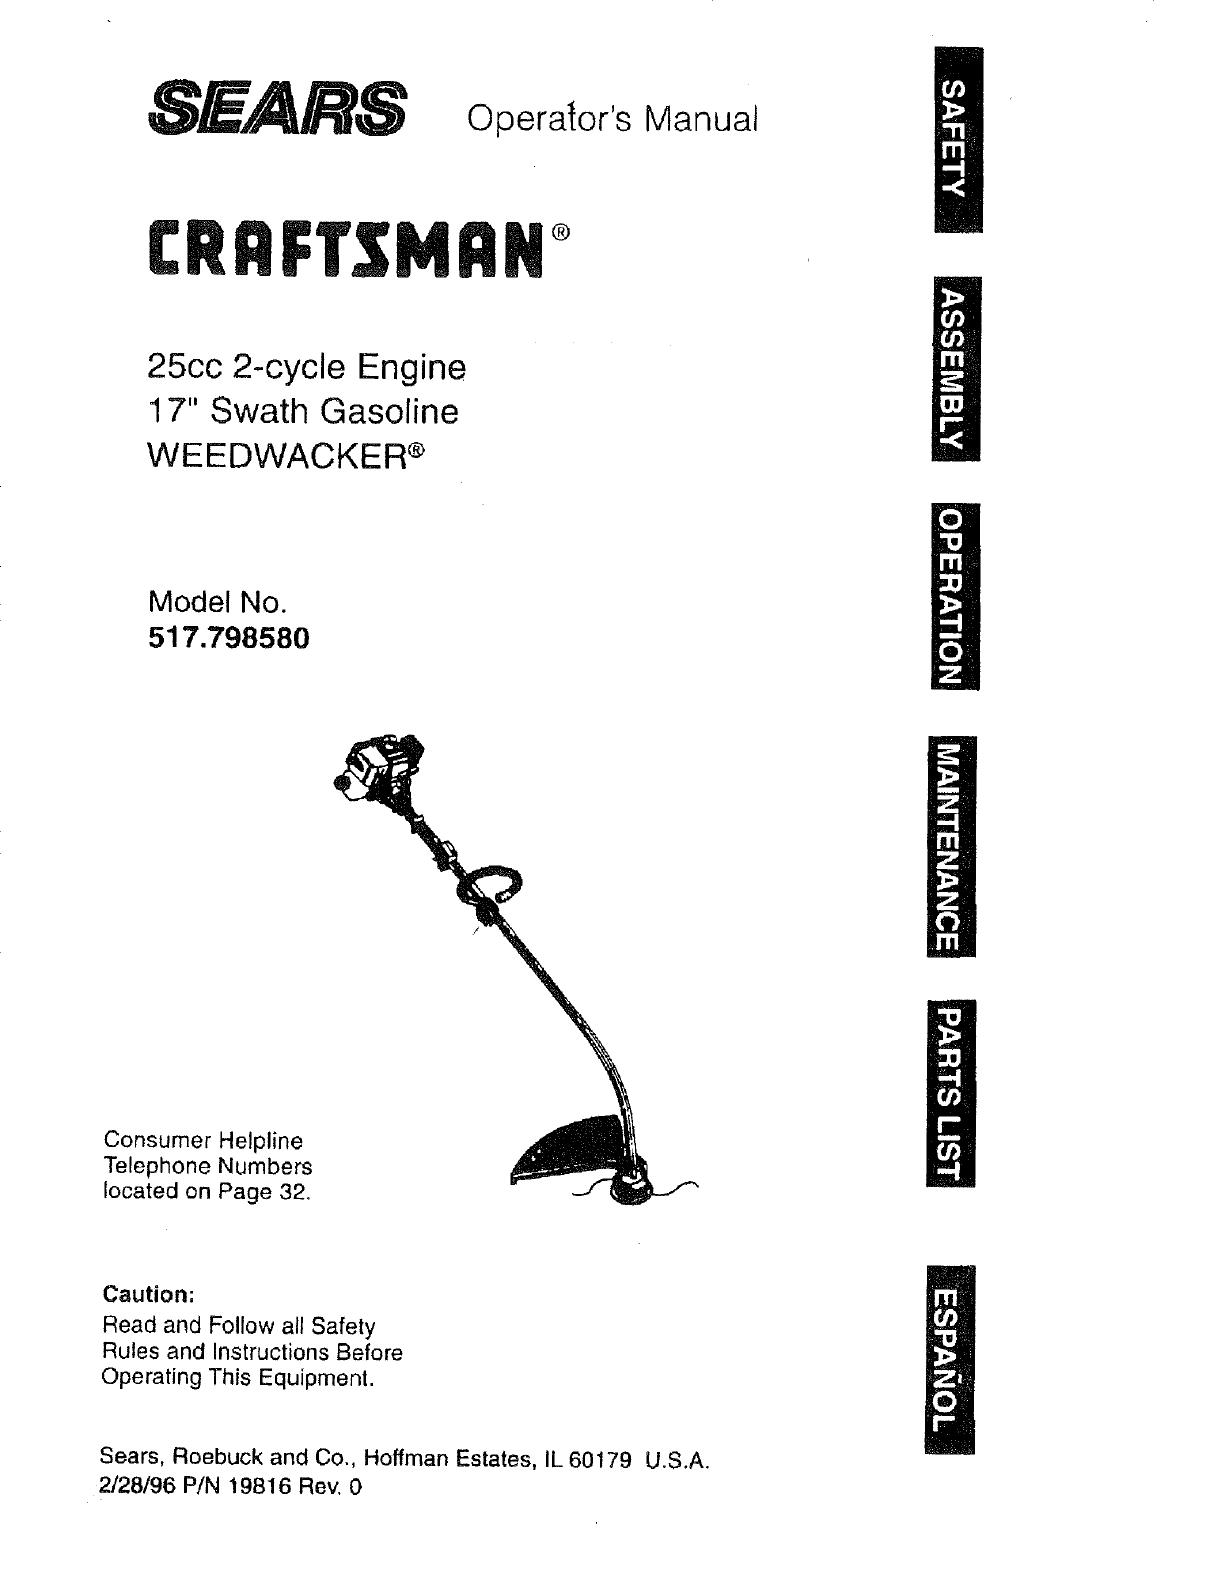 craftsman 517798580 user manual weedwacker manuals and guides l0710656 rh usermanual wiki Craftsman Snow Blower Parts Manuals Craftsman Lawn Tractor Manual